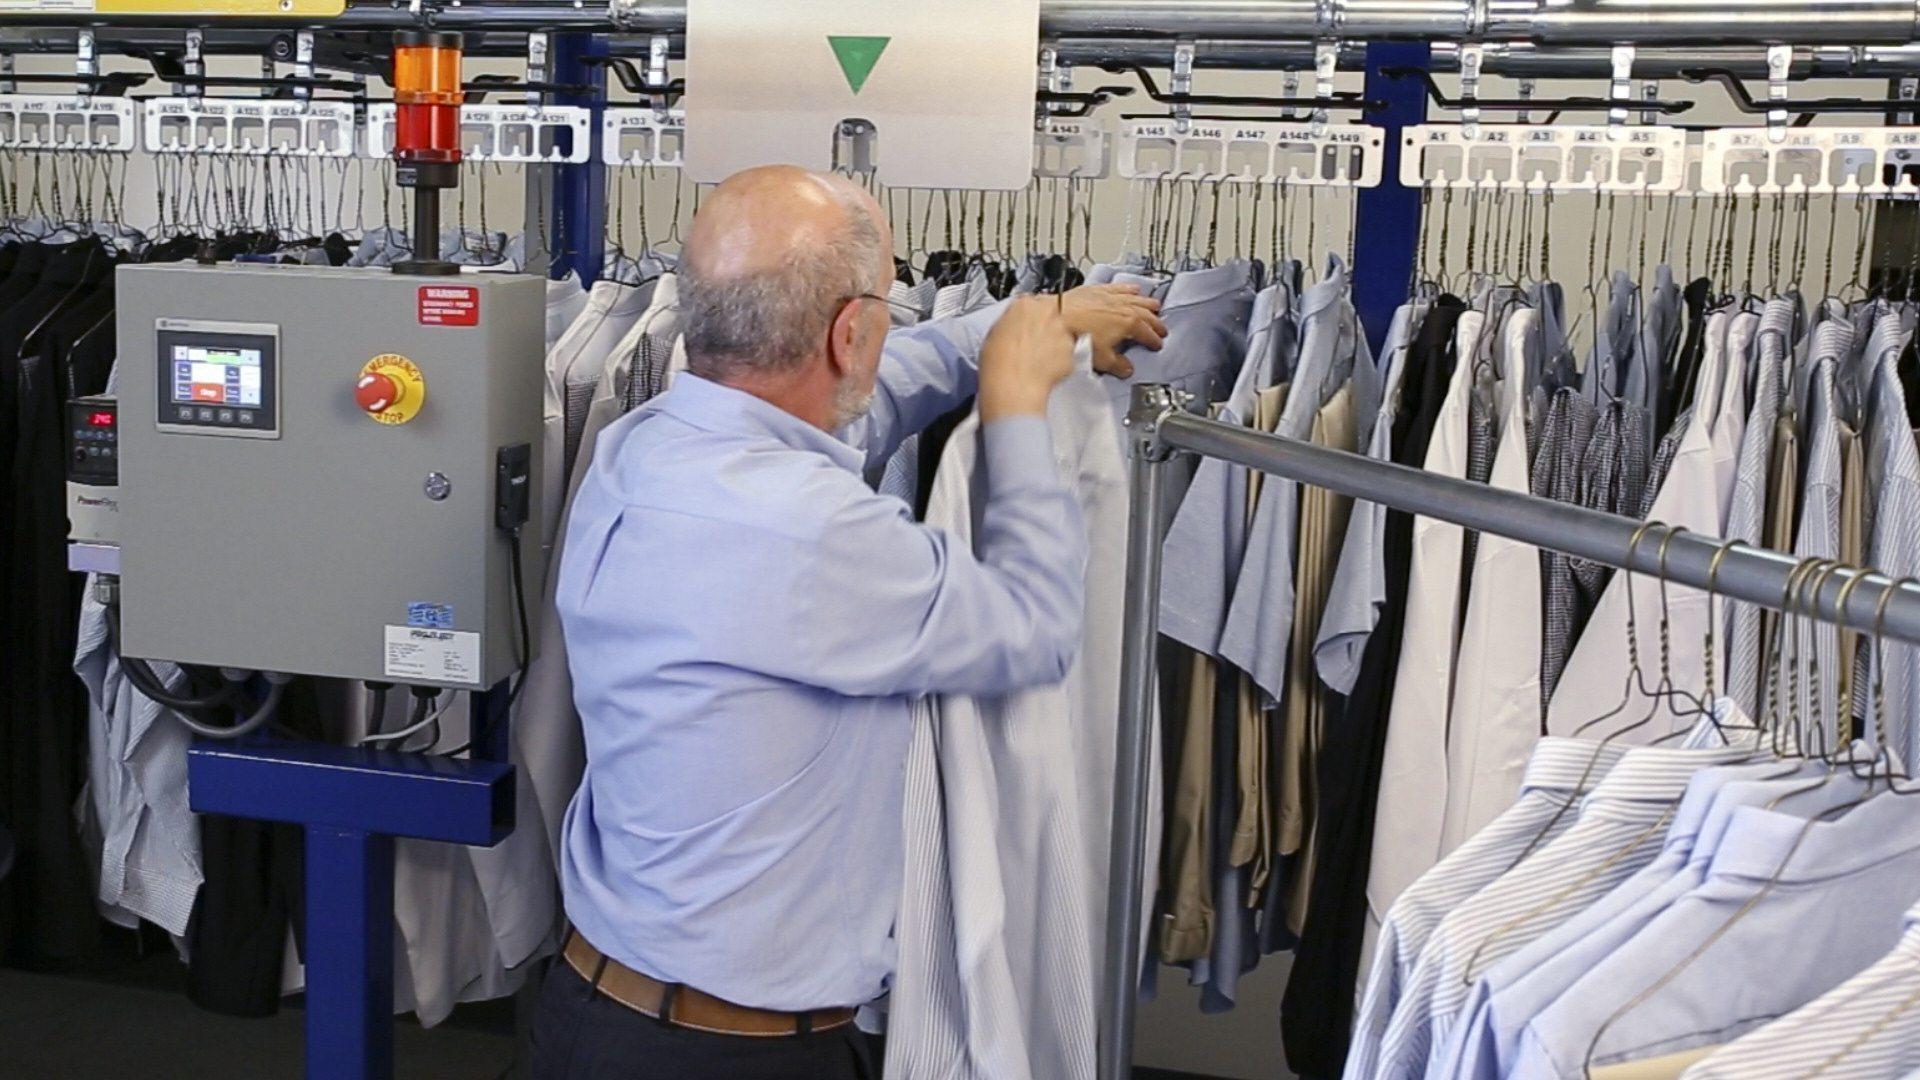 Maximize storage capacity of hanging uniforms.